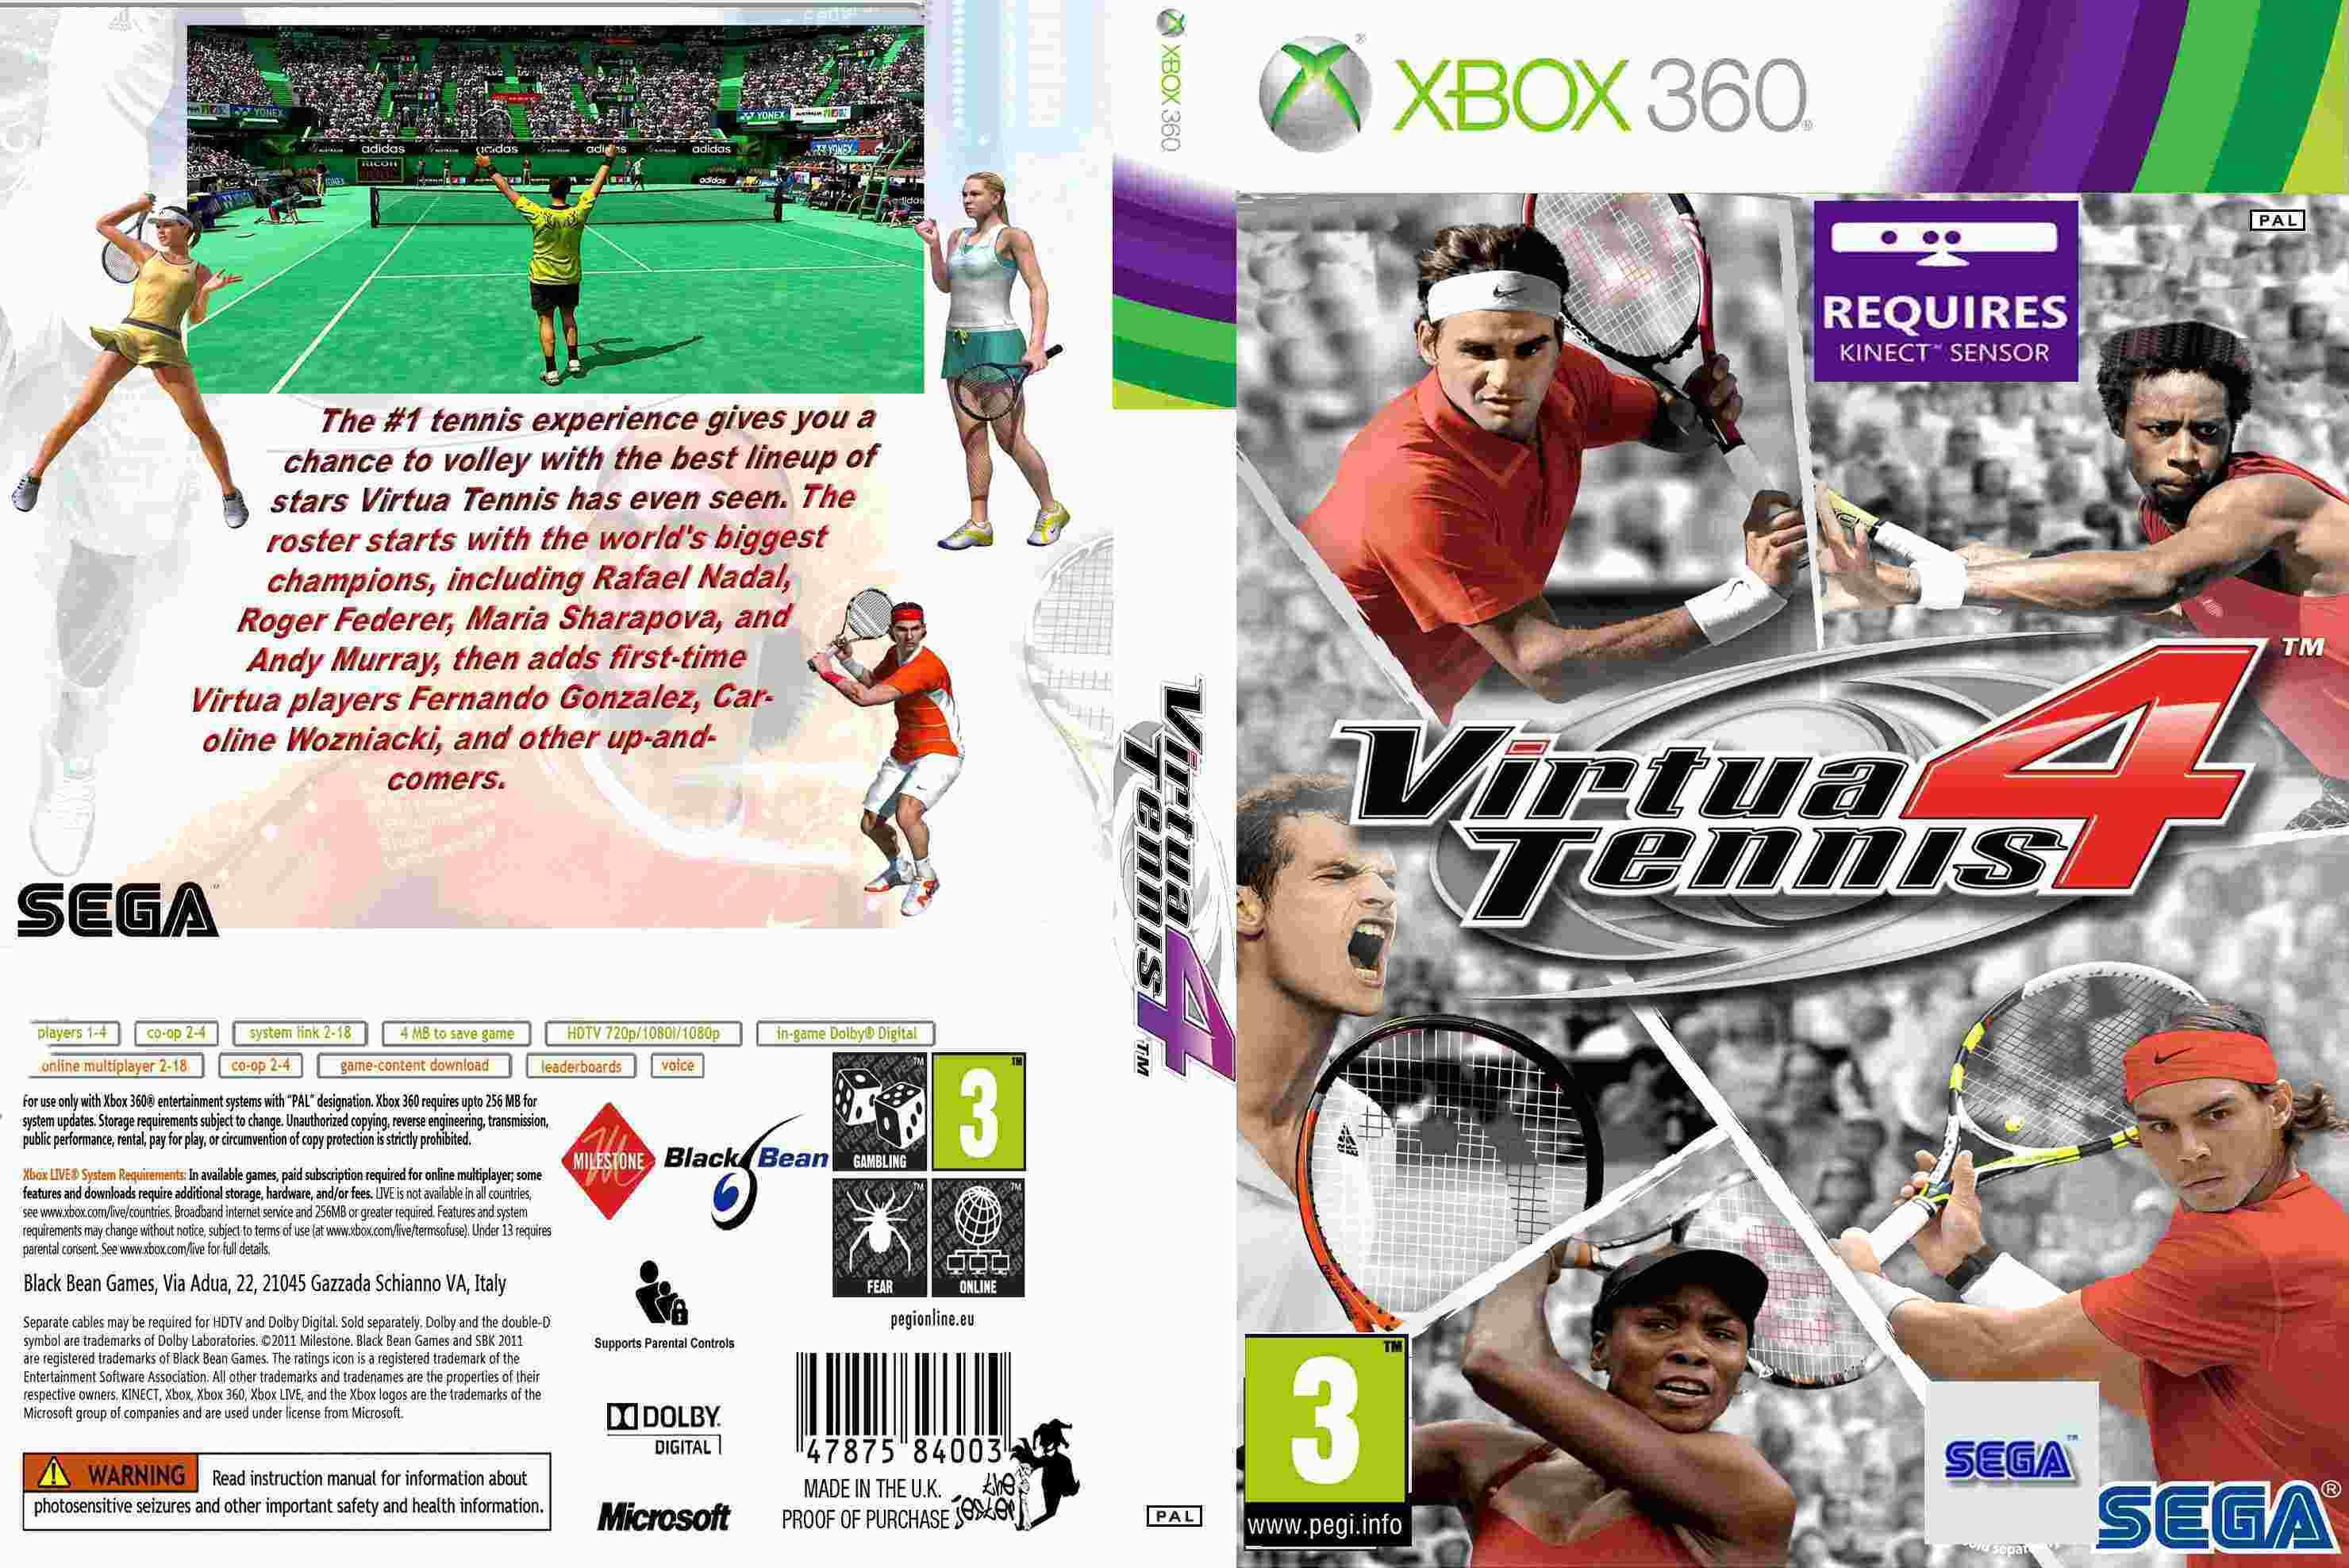 XBOX 360 Kinect Virtua Tennis 4